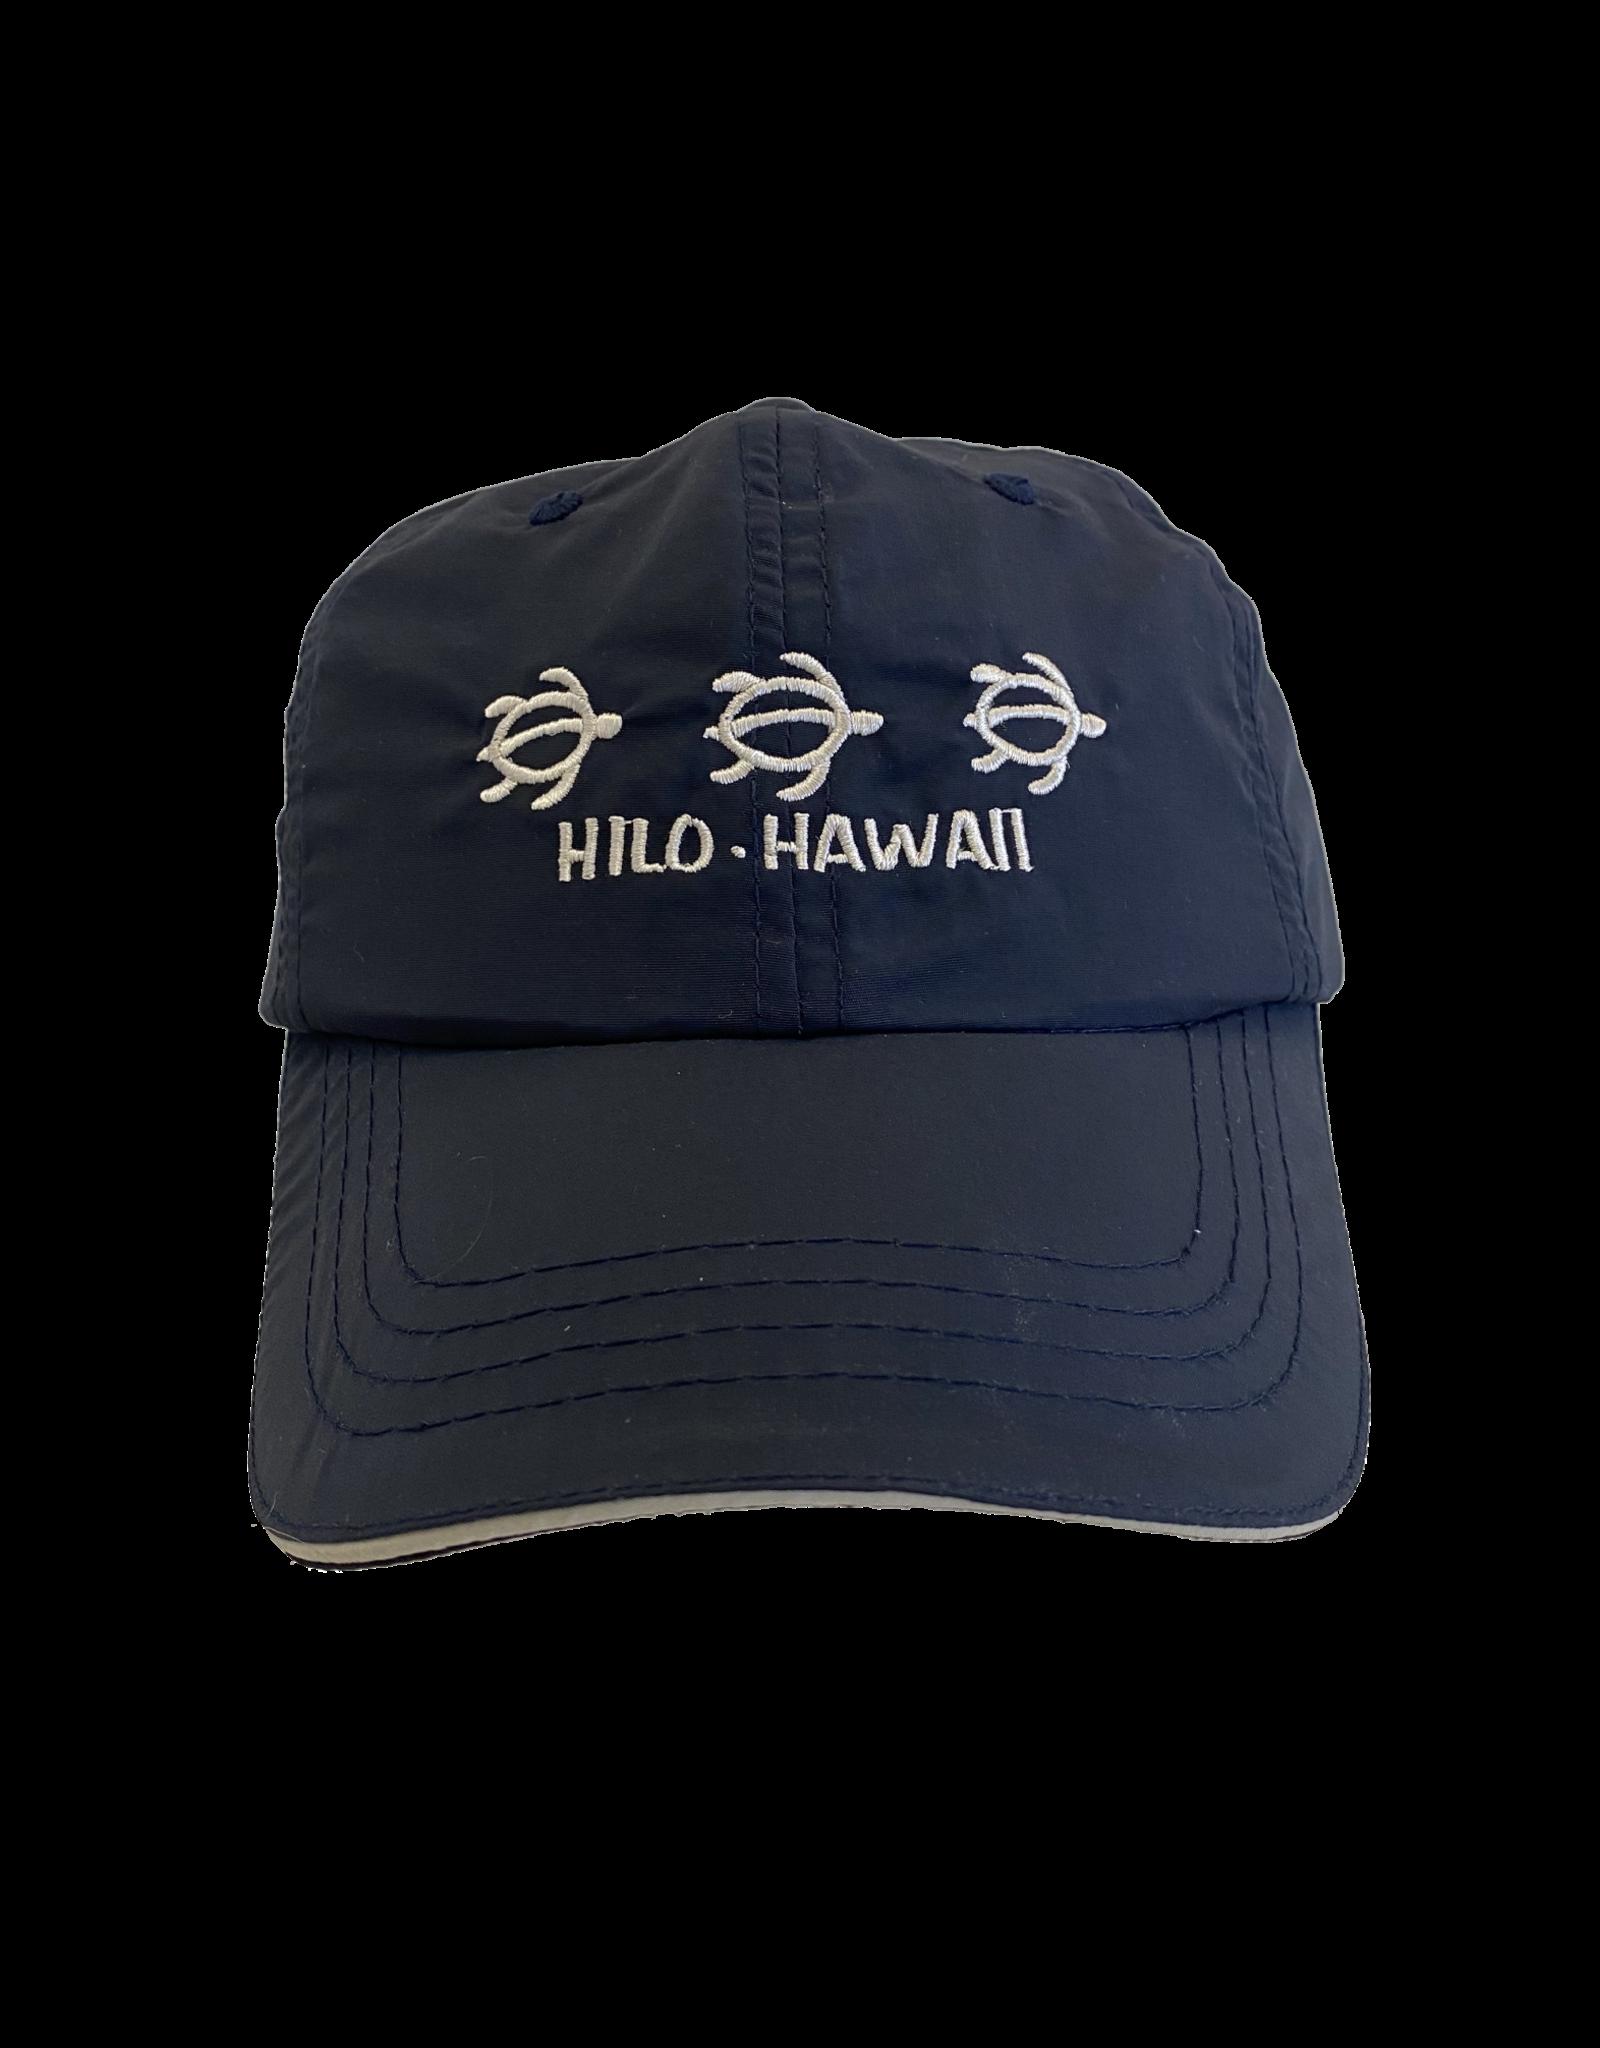 Dorfman Pacific Supplex Baseball Cap